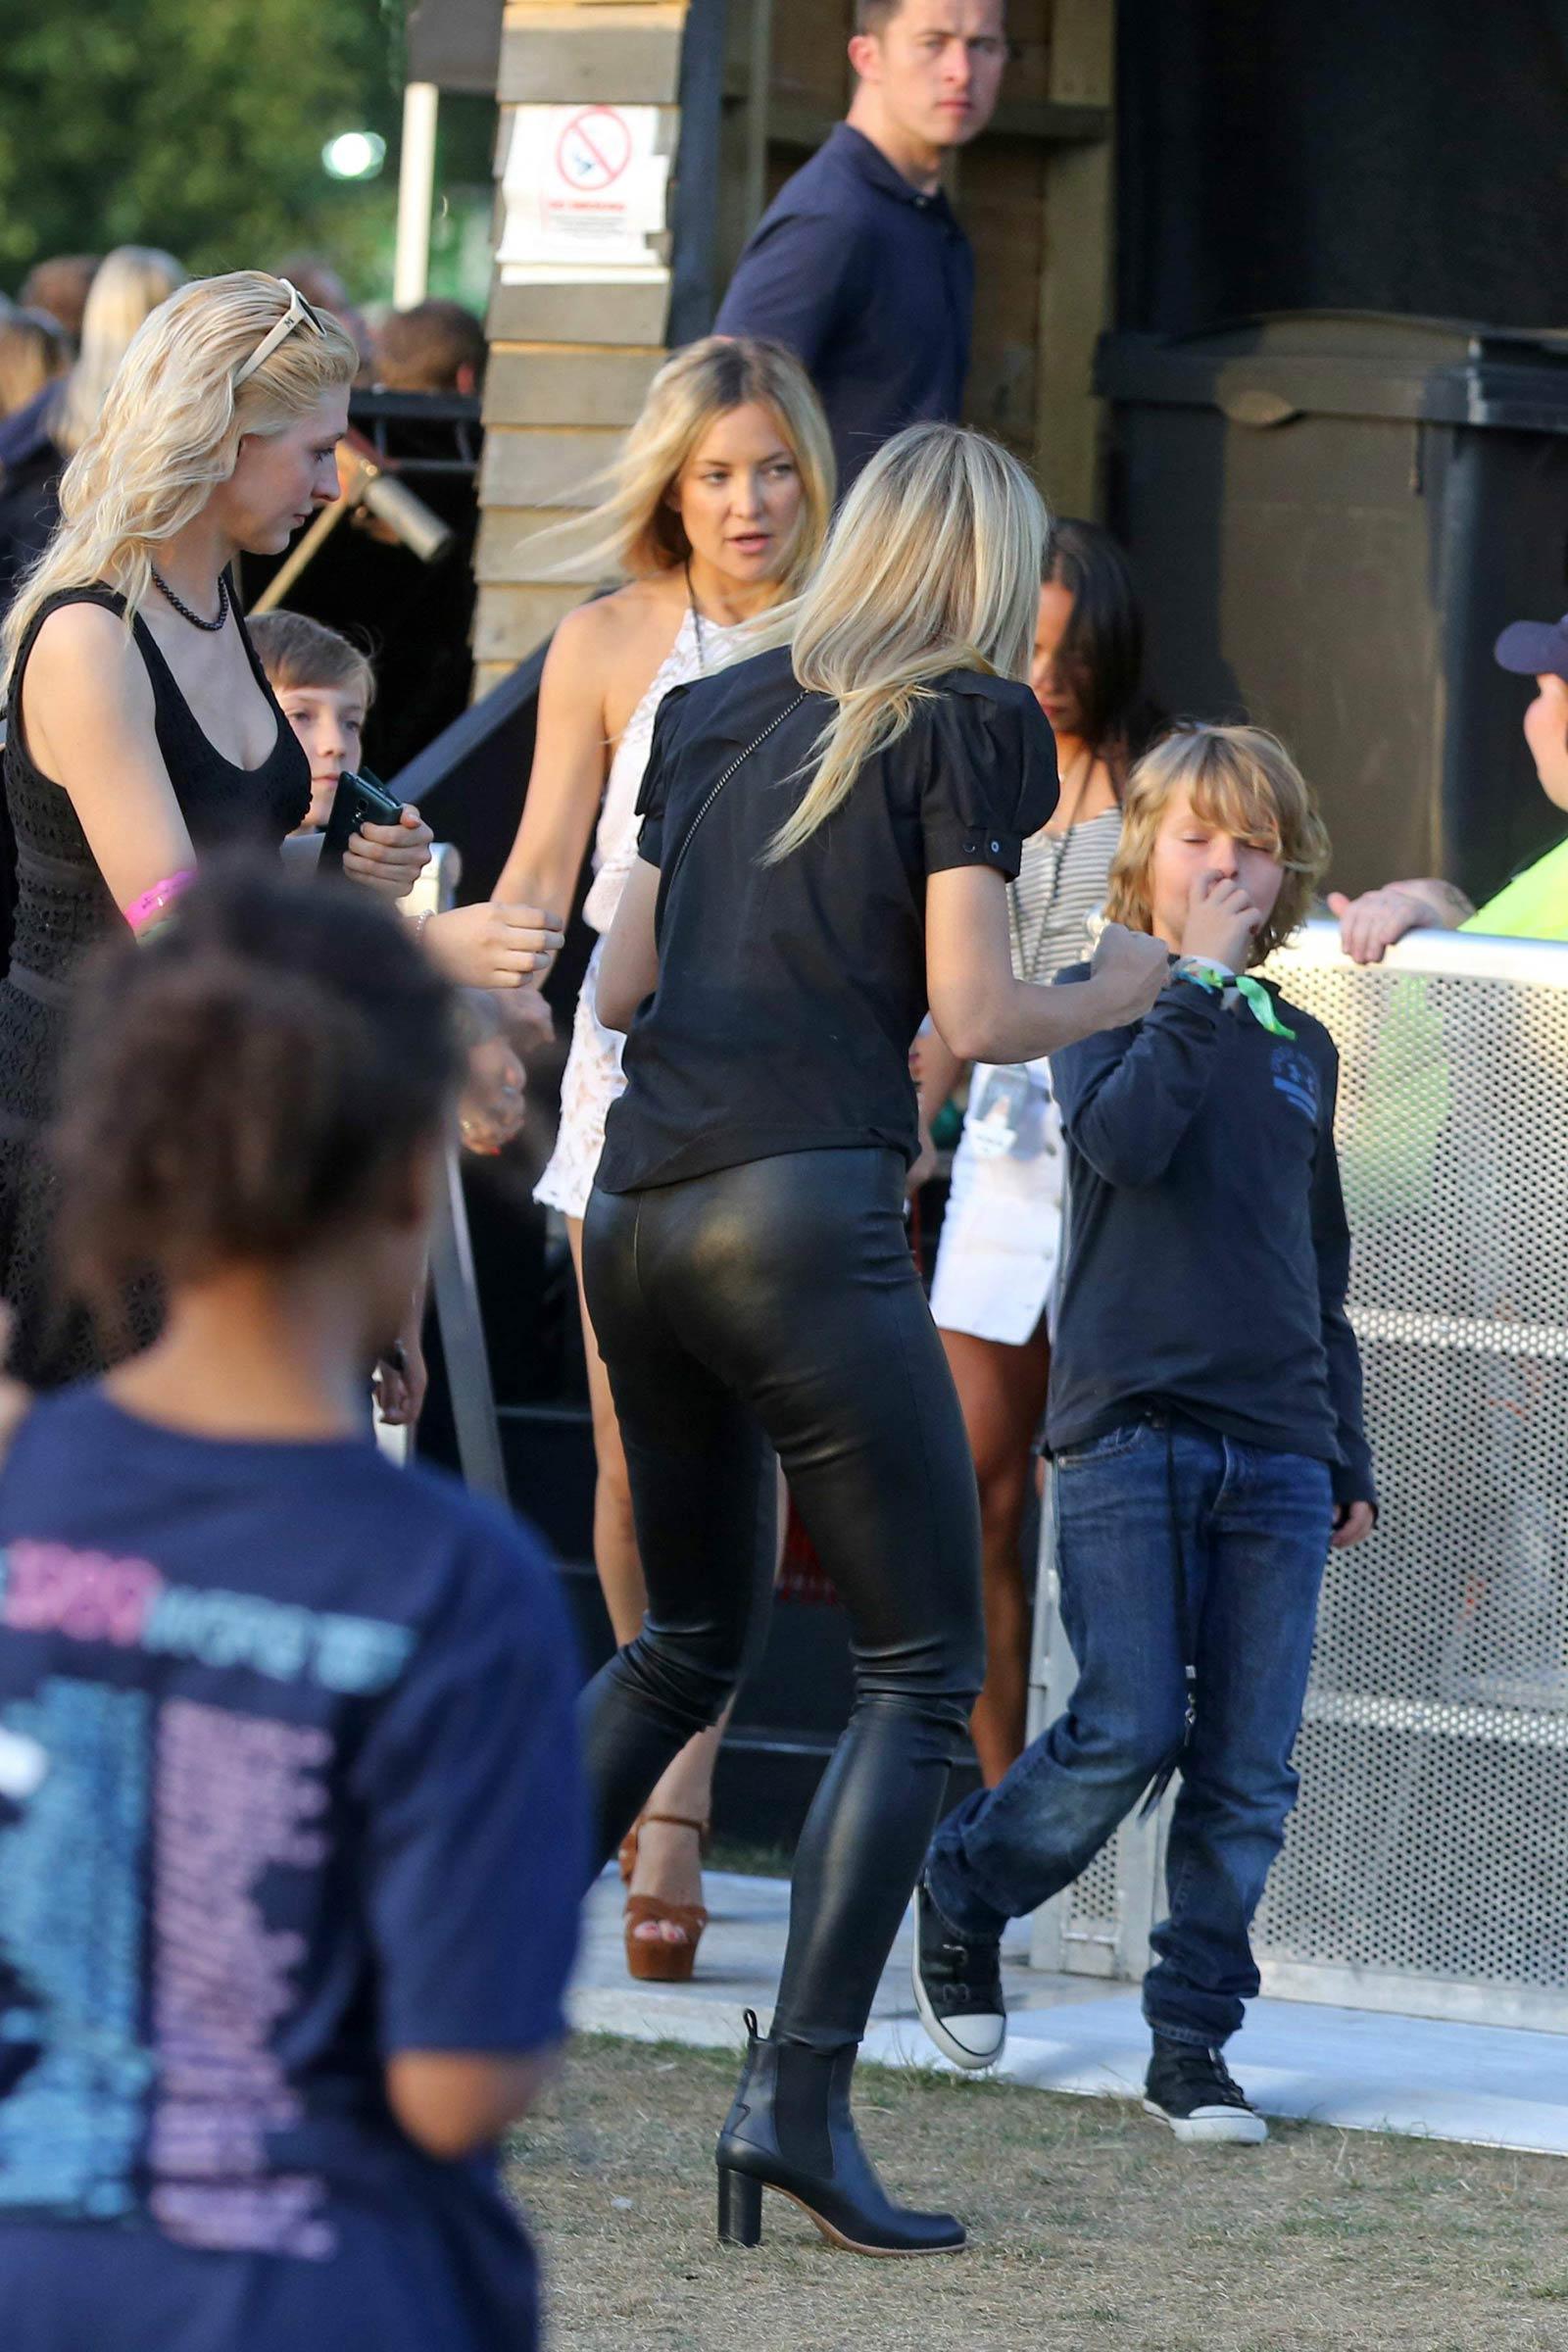 Gallery - Leather Celebrities Gwyneth Paltrow Twitter